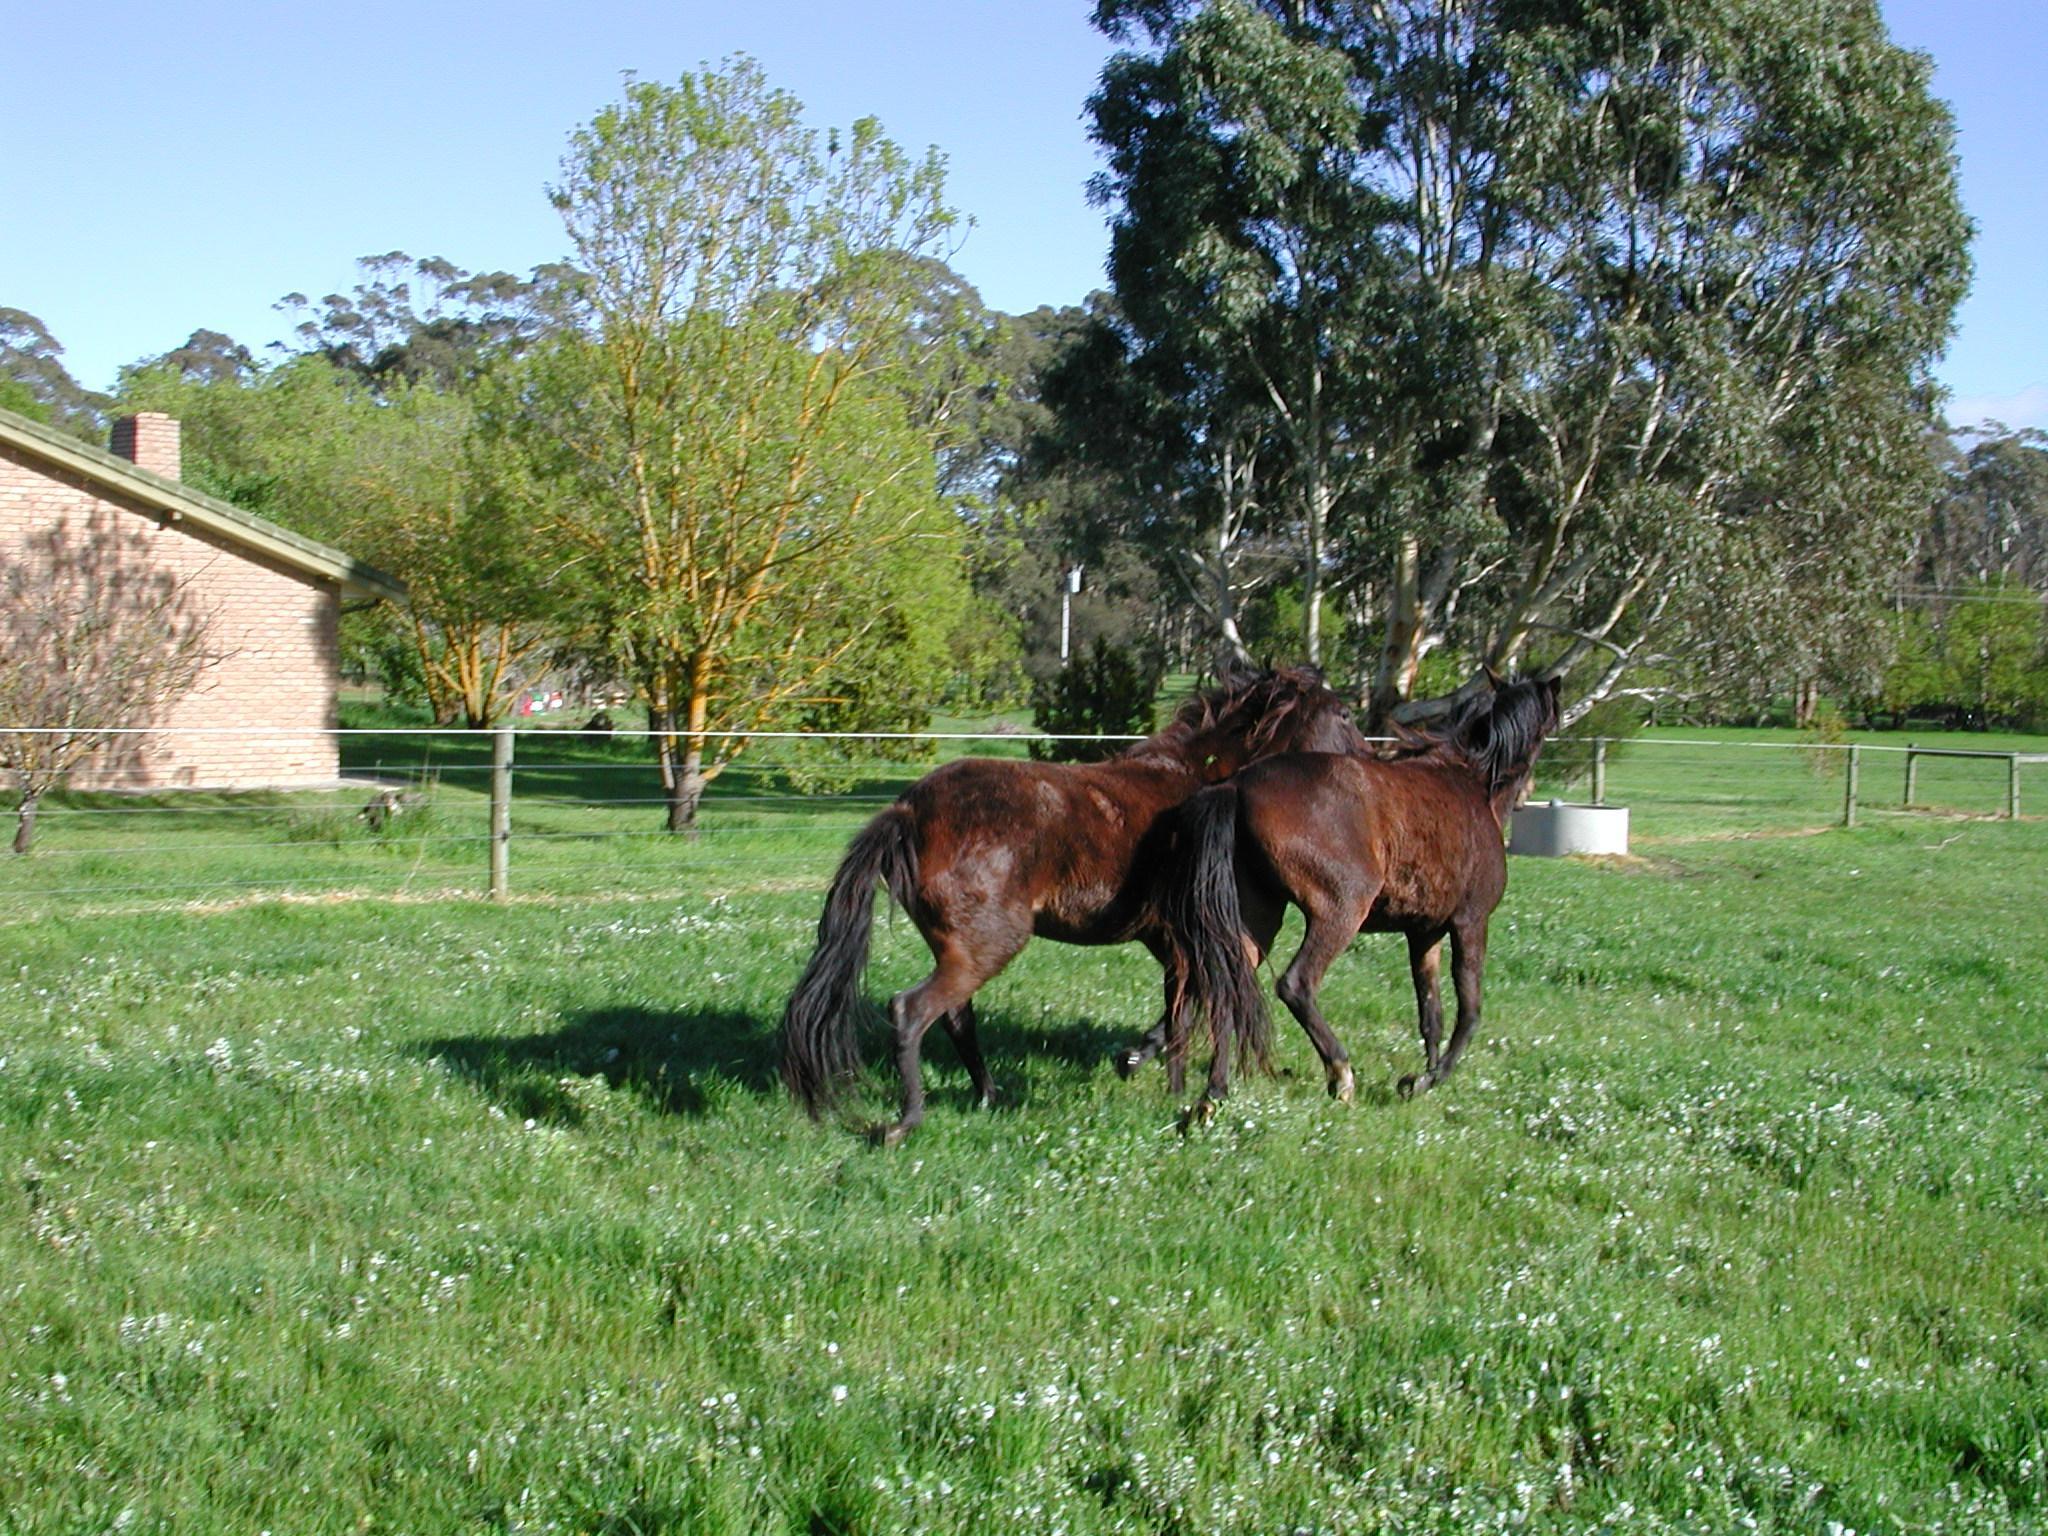 Horses-6.jpeg